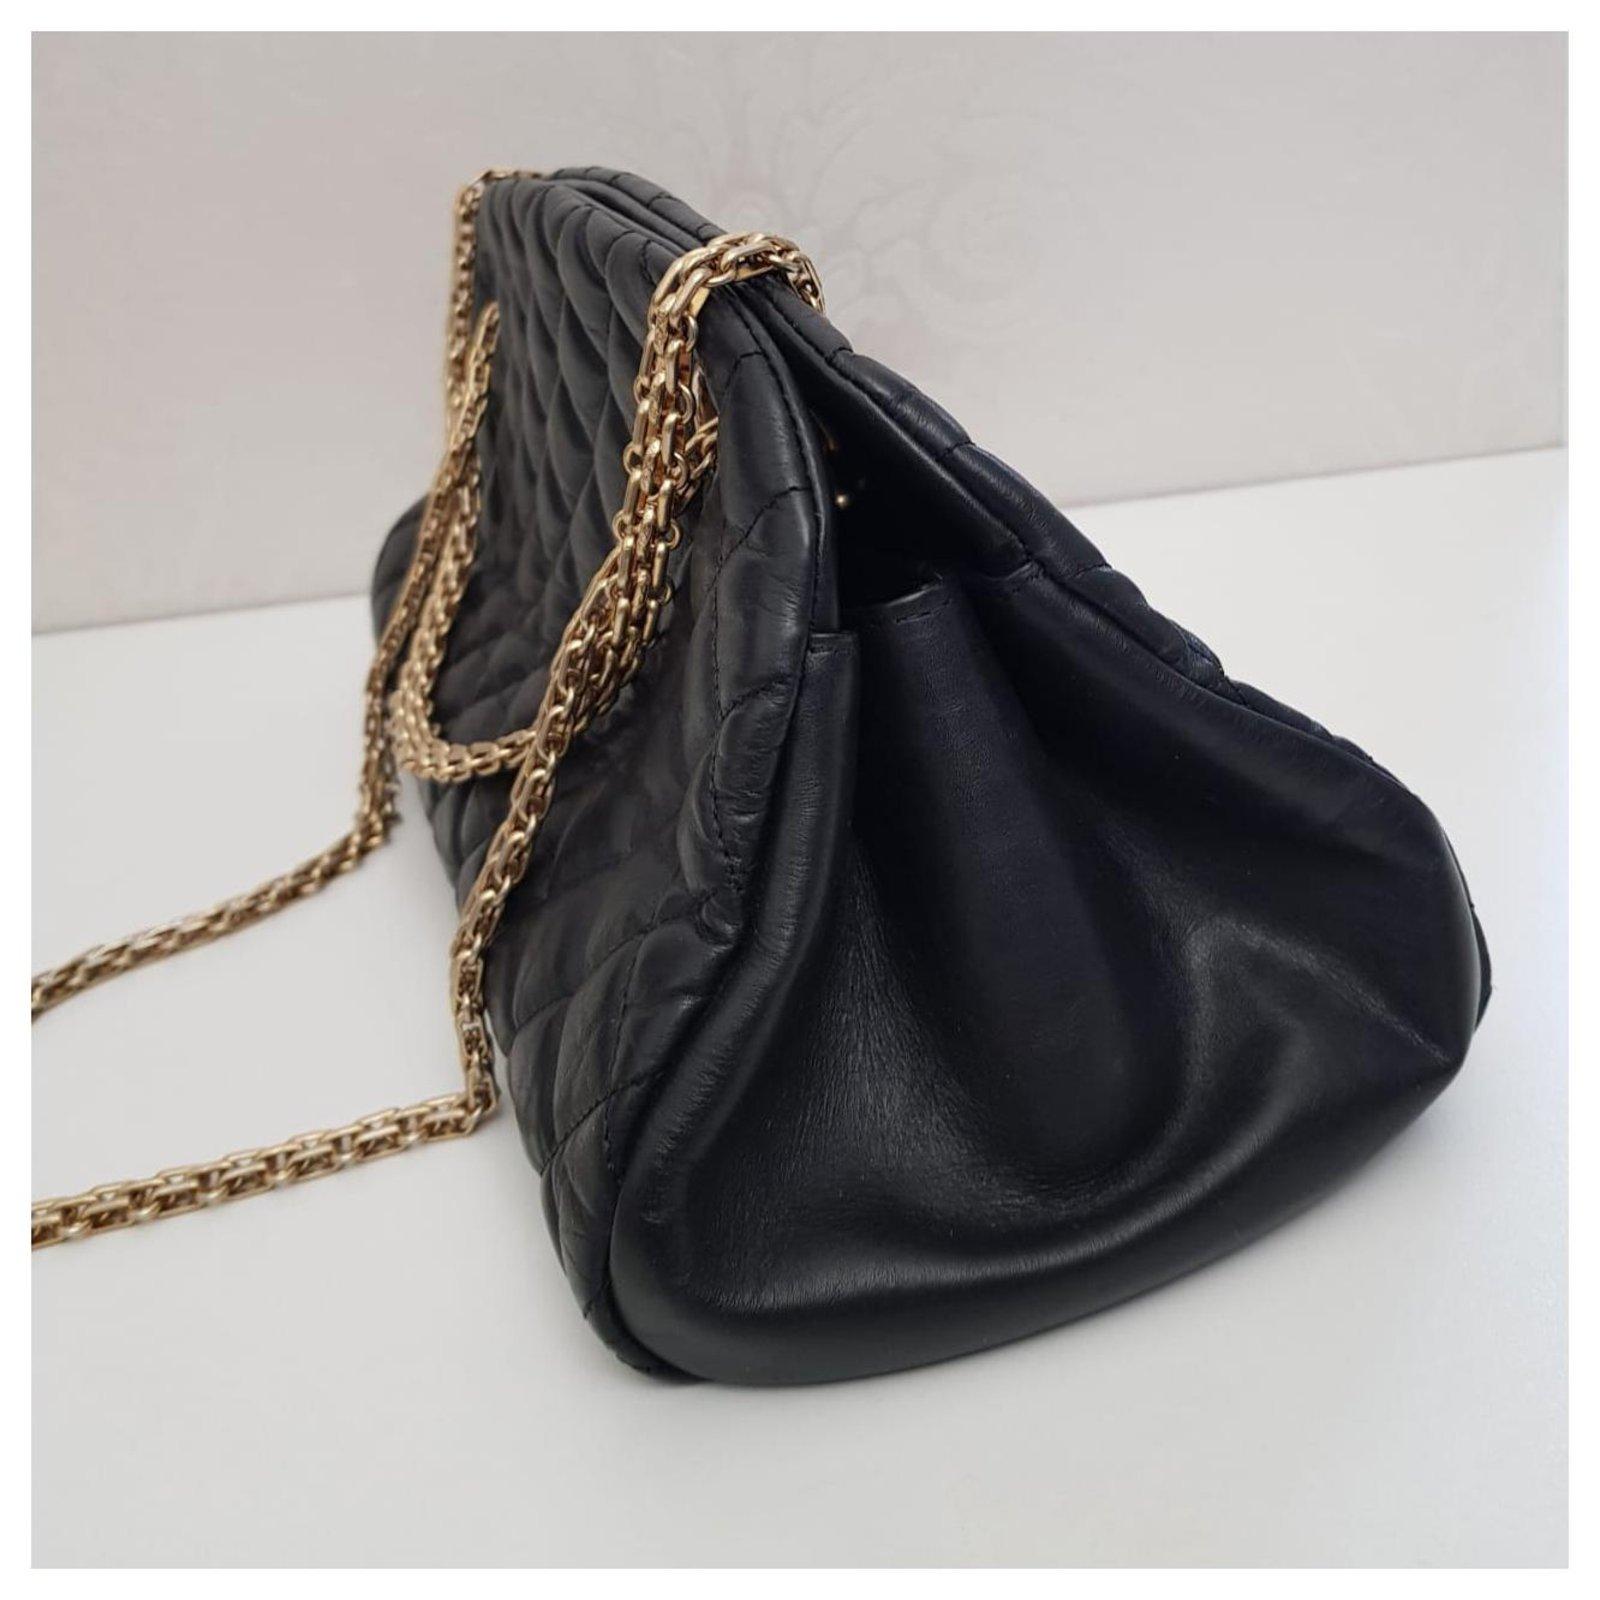 d12f014fb6ef Chanel mademoiselle Handbags Leather Hazelnut ref.123160 - Joli Closet